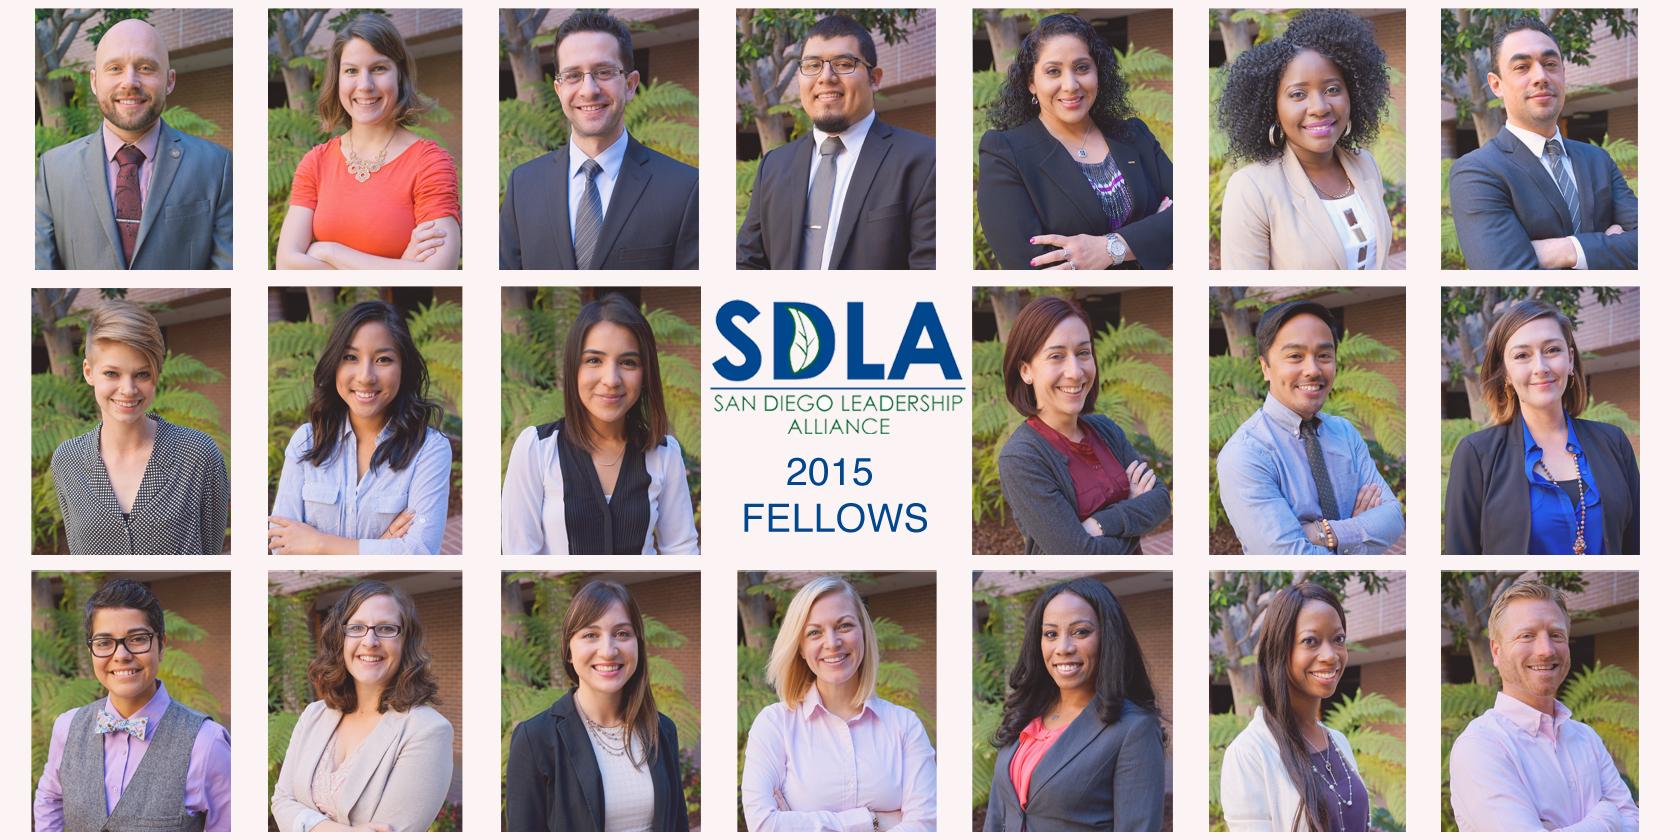 2015 SDLA Fellows